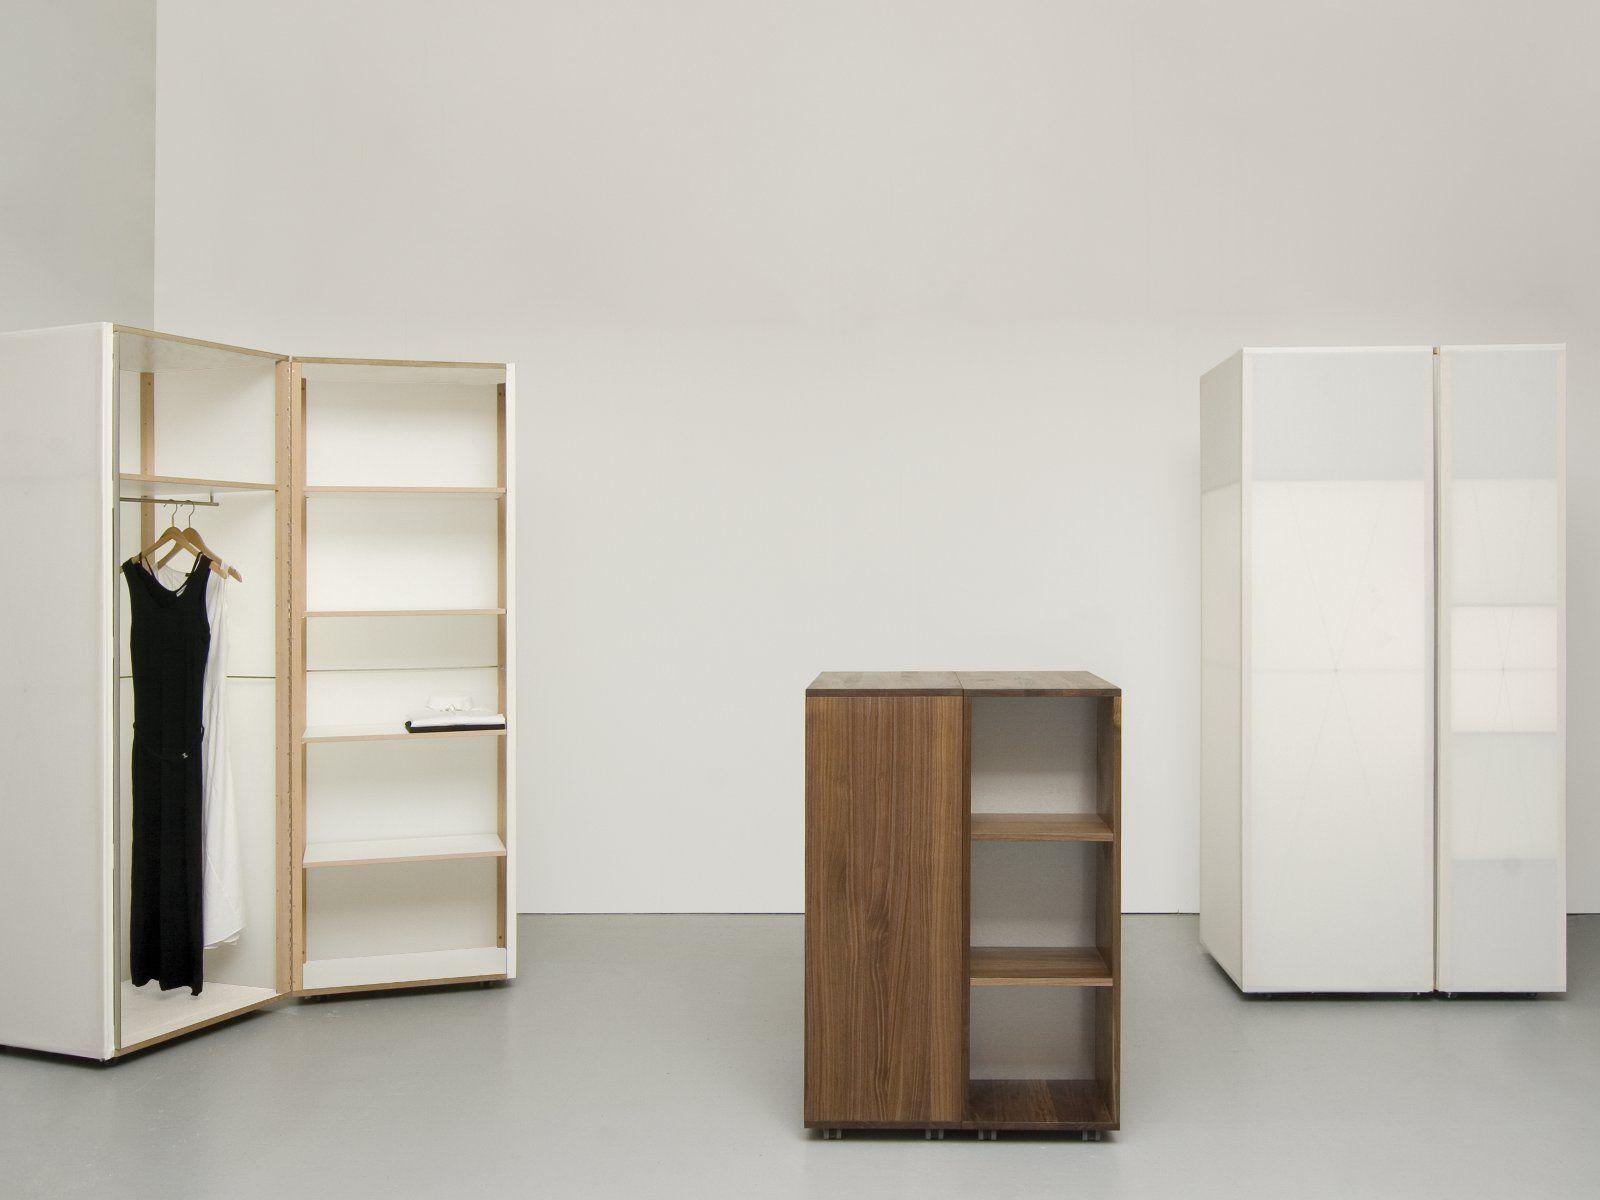 quartier kleiderschrank by sanktjohanser design matthias hubert sanktjohanser. Black Bedroom Furniture Sets. Home Design Ideas